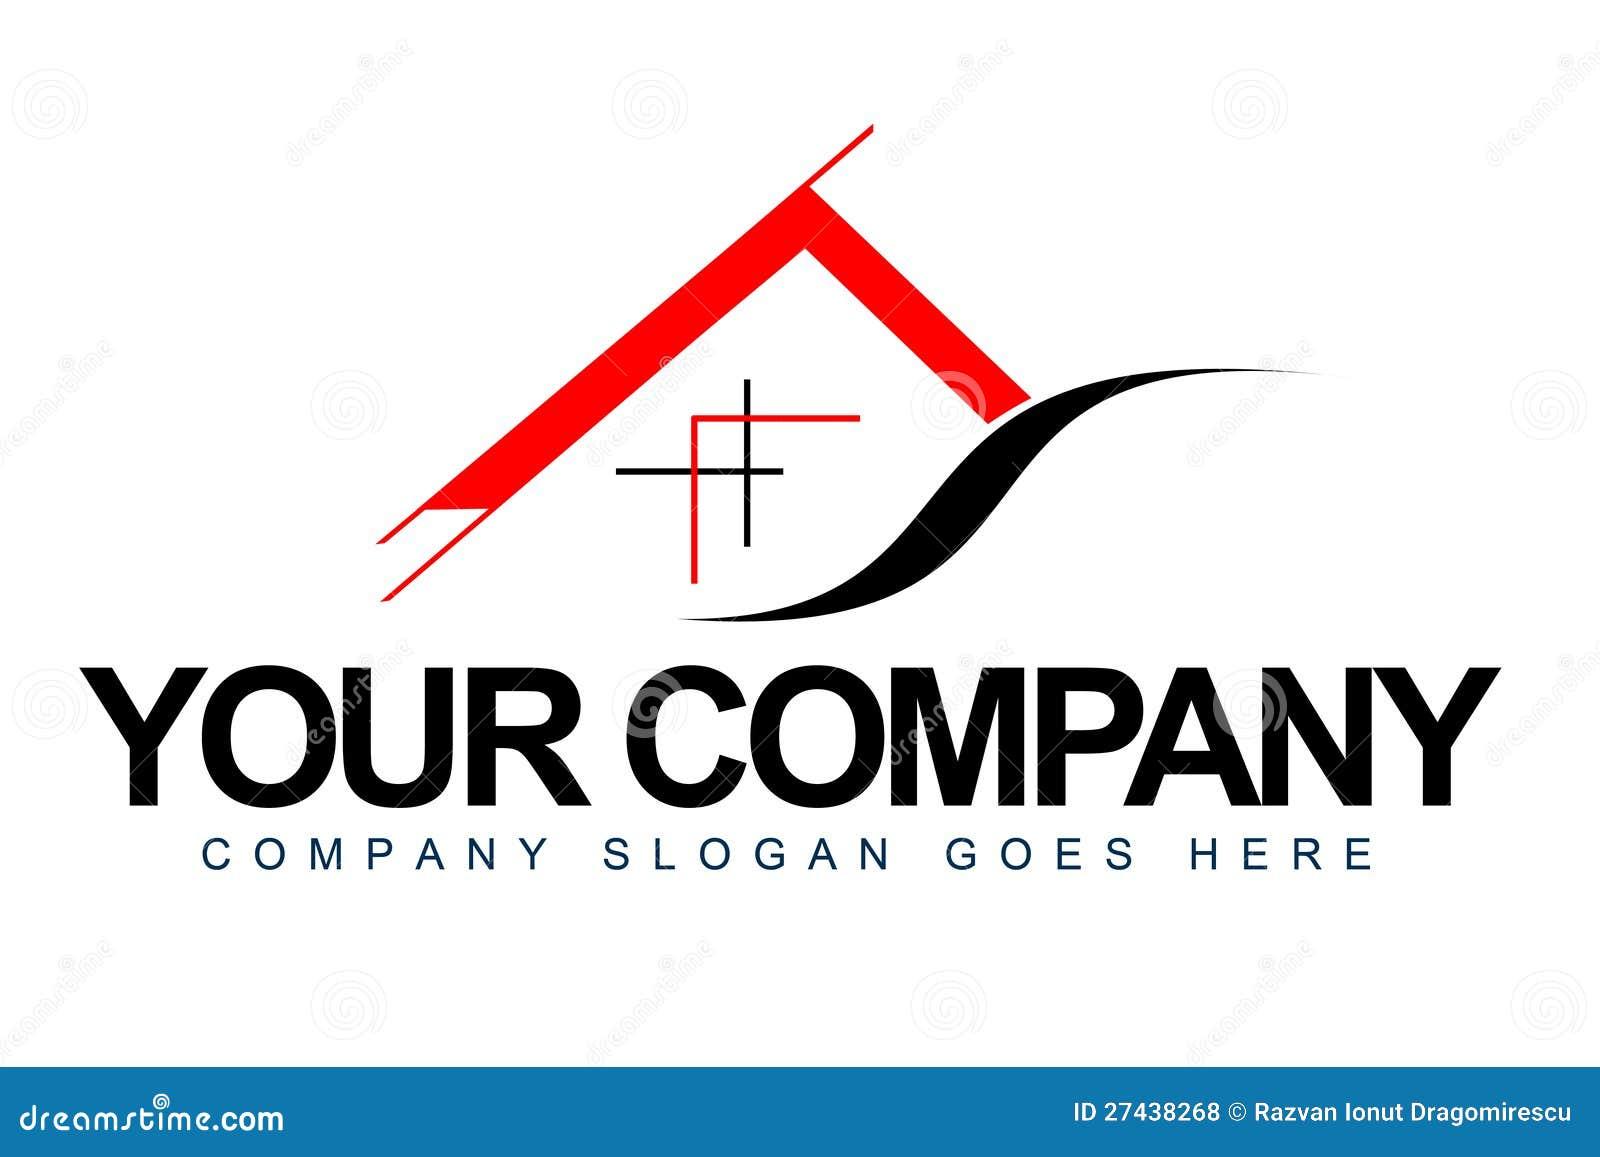 Architecture Logo Royalty Free Stock Photos Image 27438268